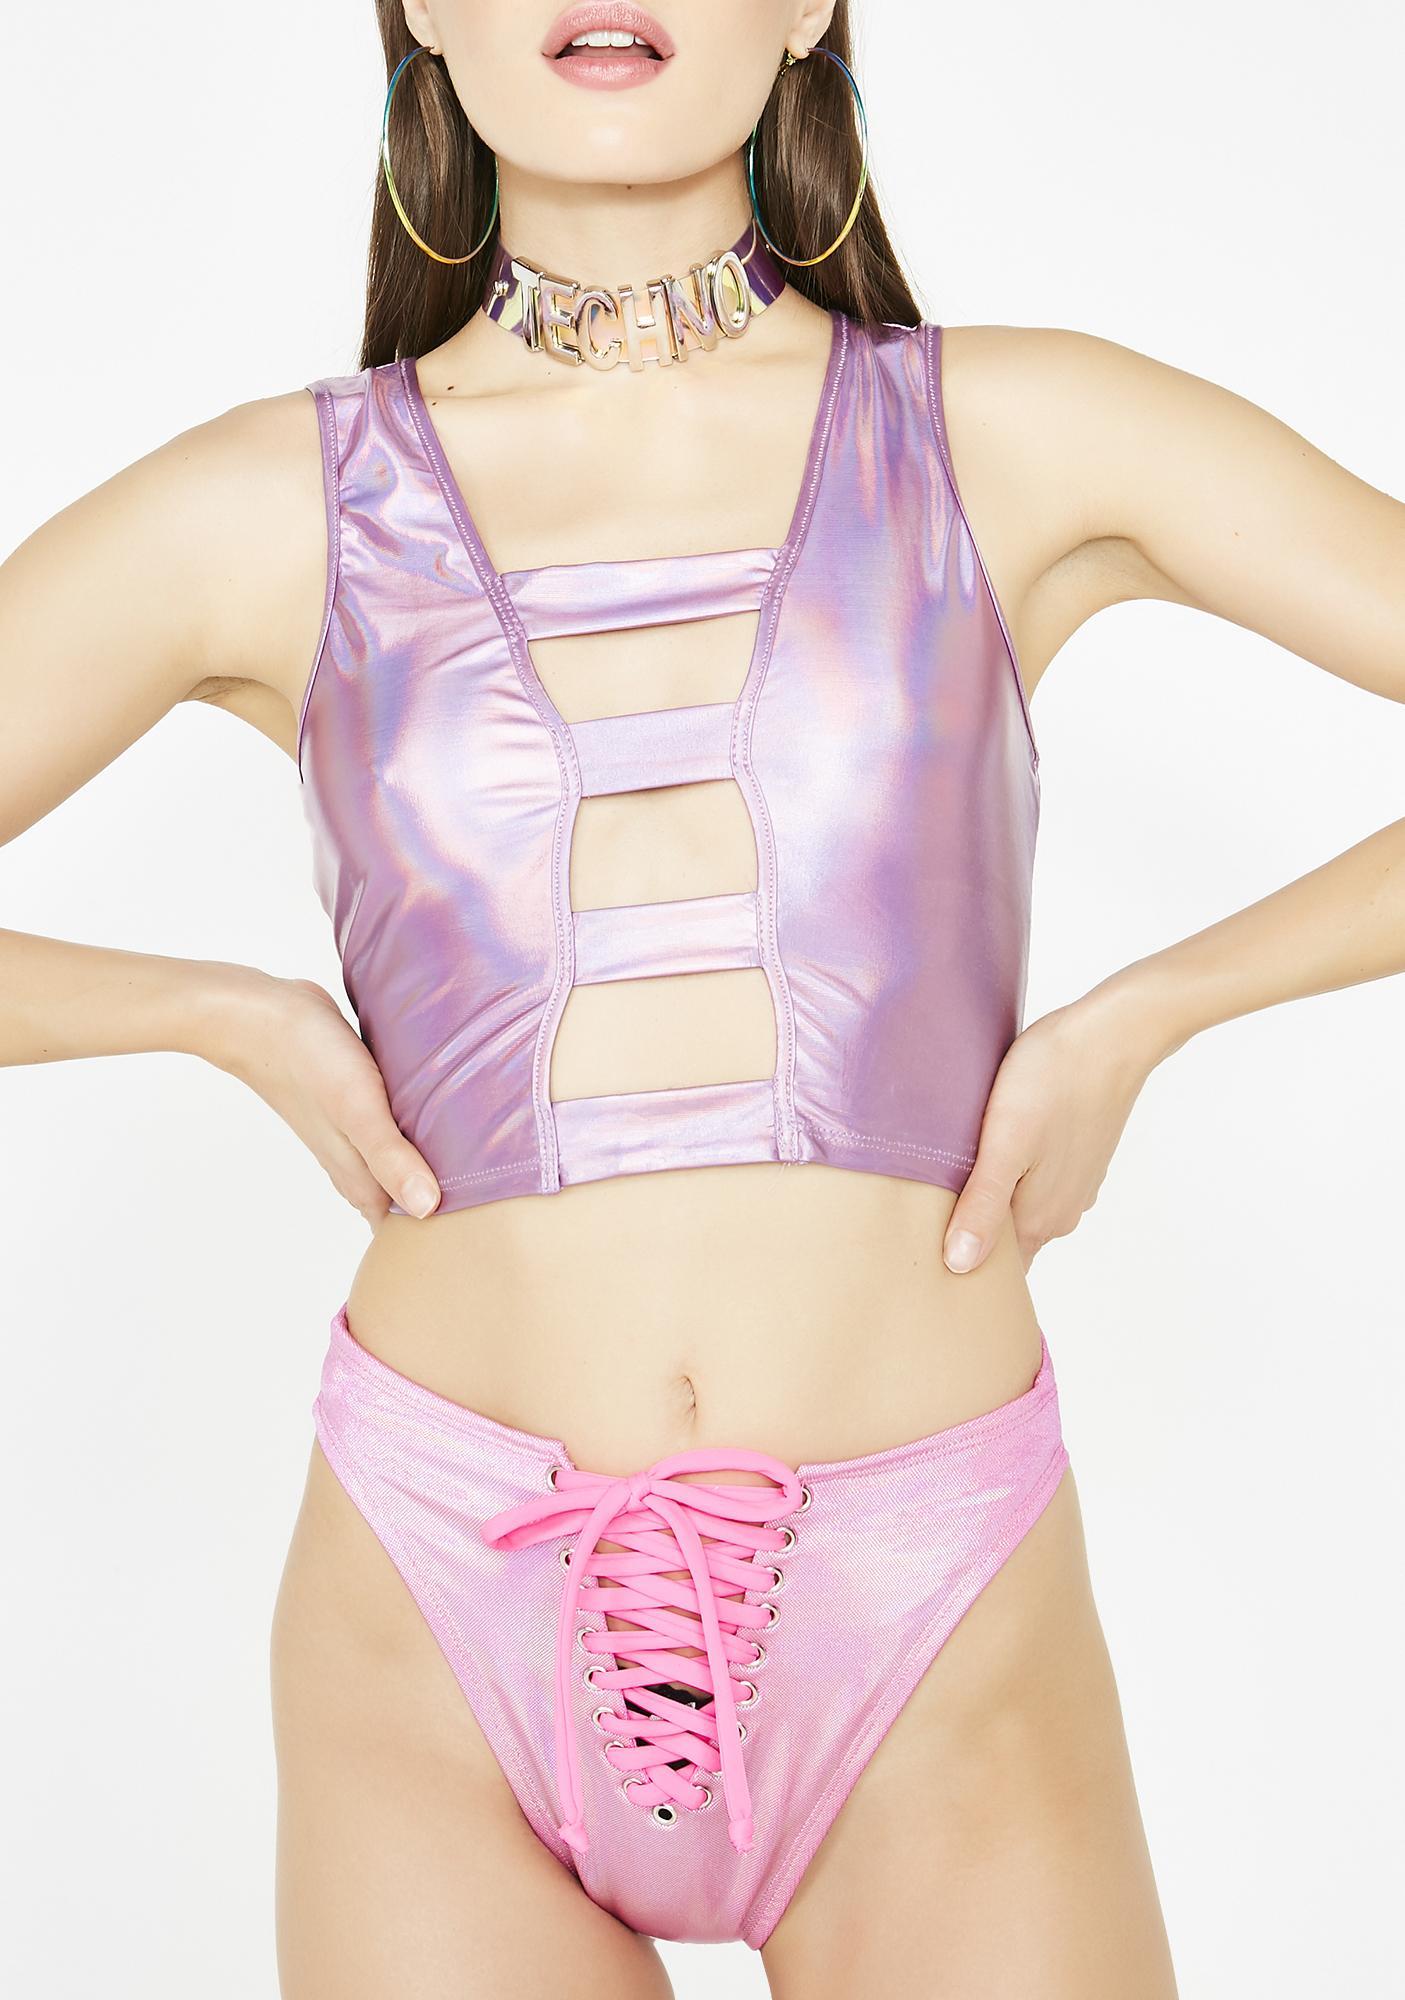 J Valentine Candy Cosmic Baddie Lace-Up Bottoms